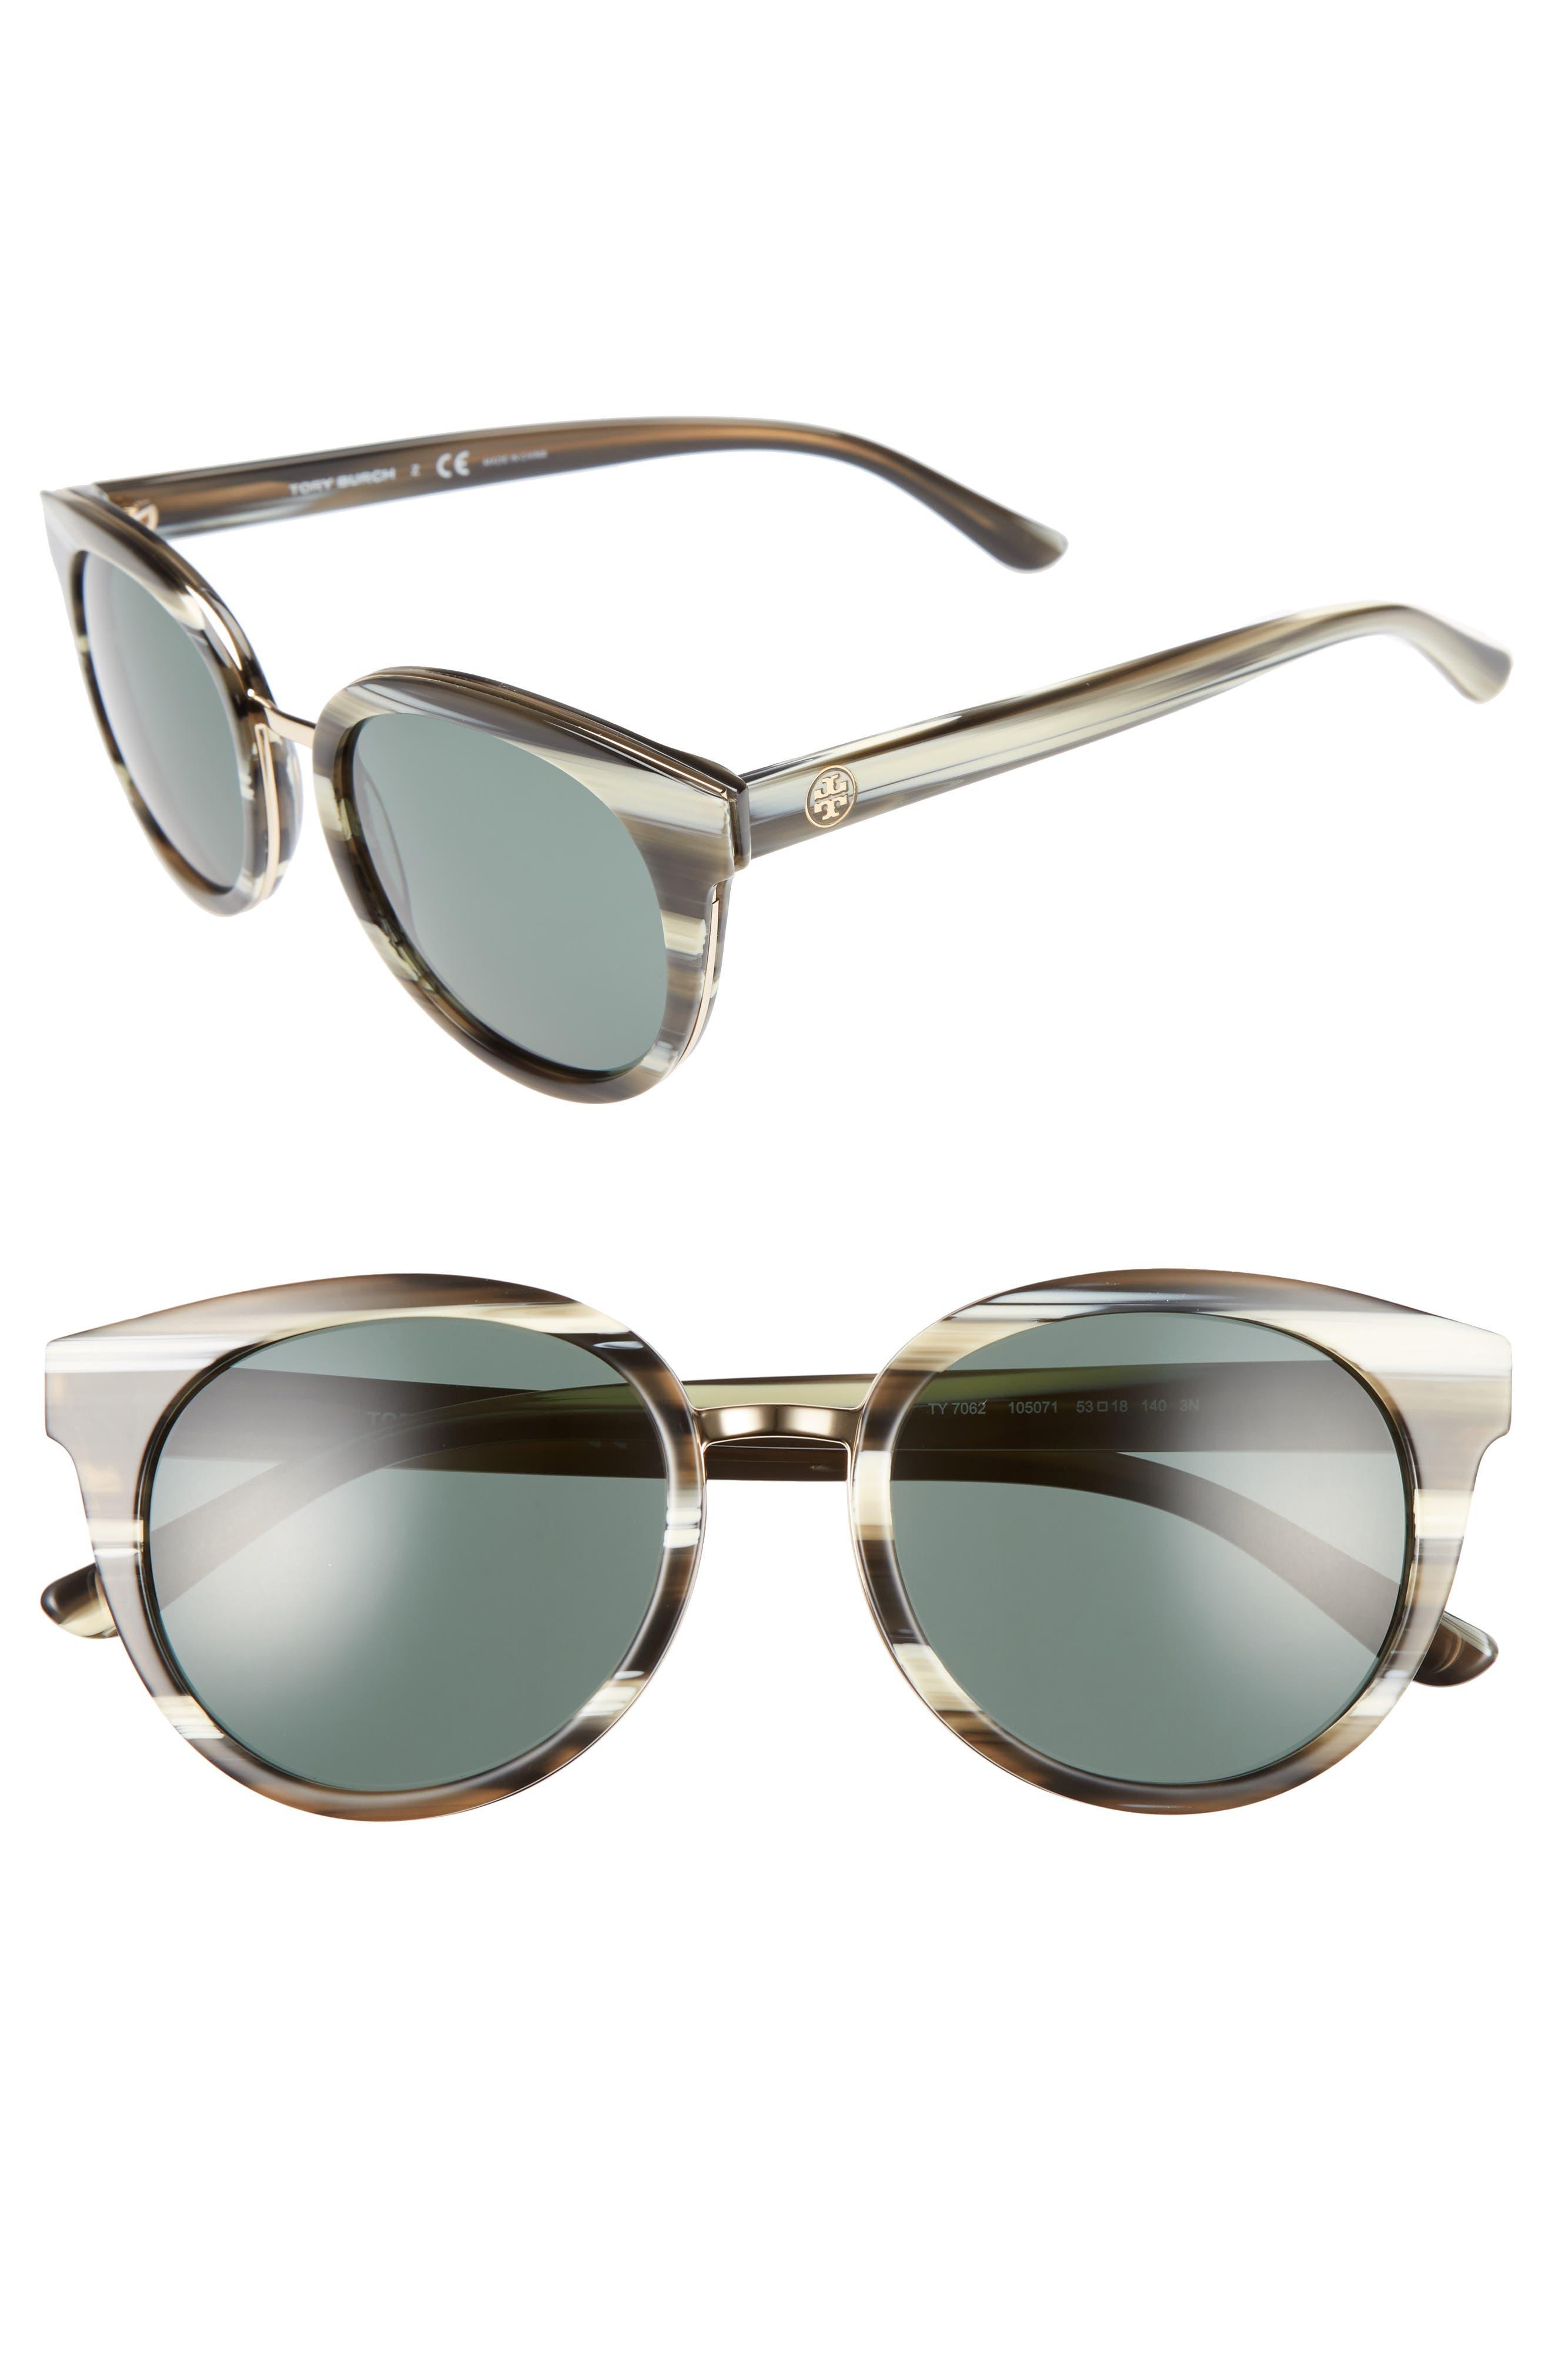 53mm Sunglasses,                         Main,                         color, Olive